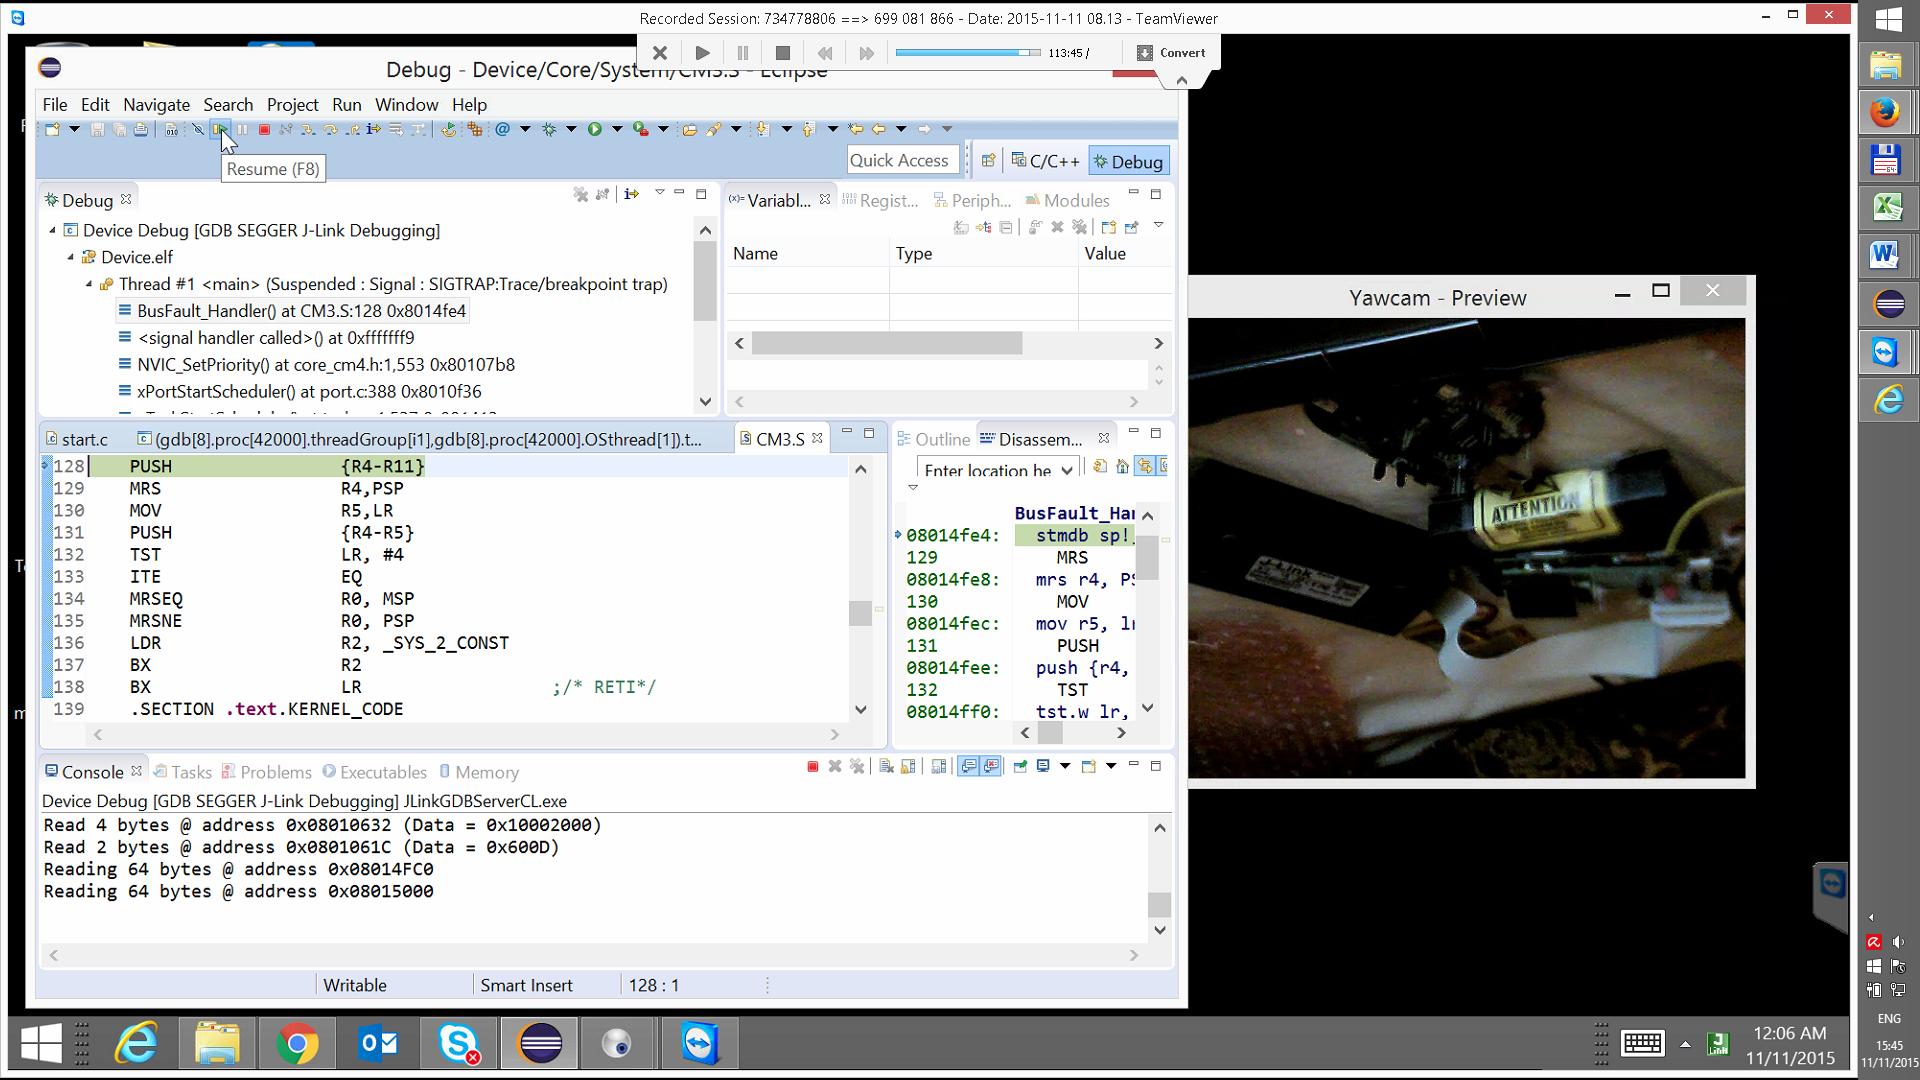 Remote Debugging of custom STM ARM Cortex-M4 MCU based board.